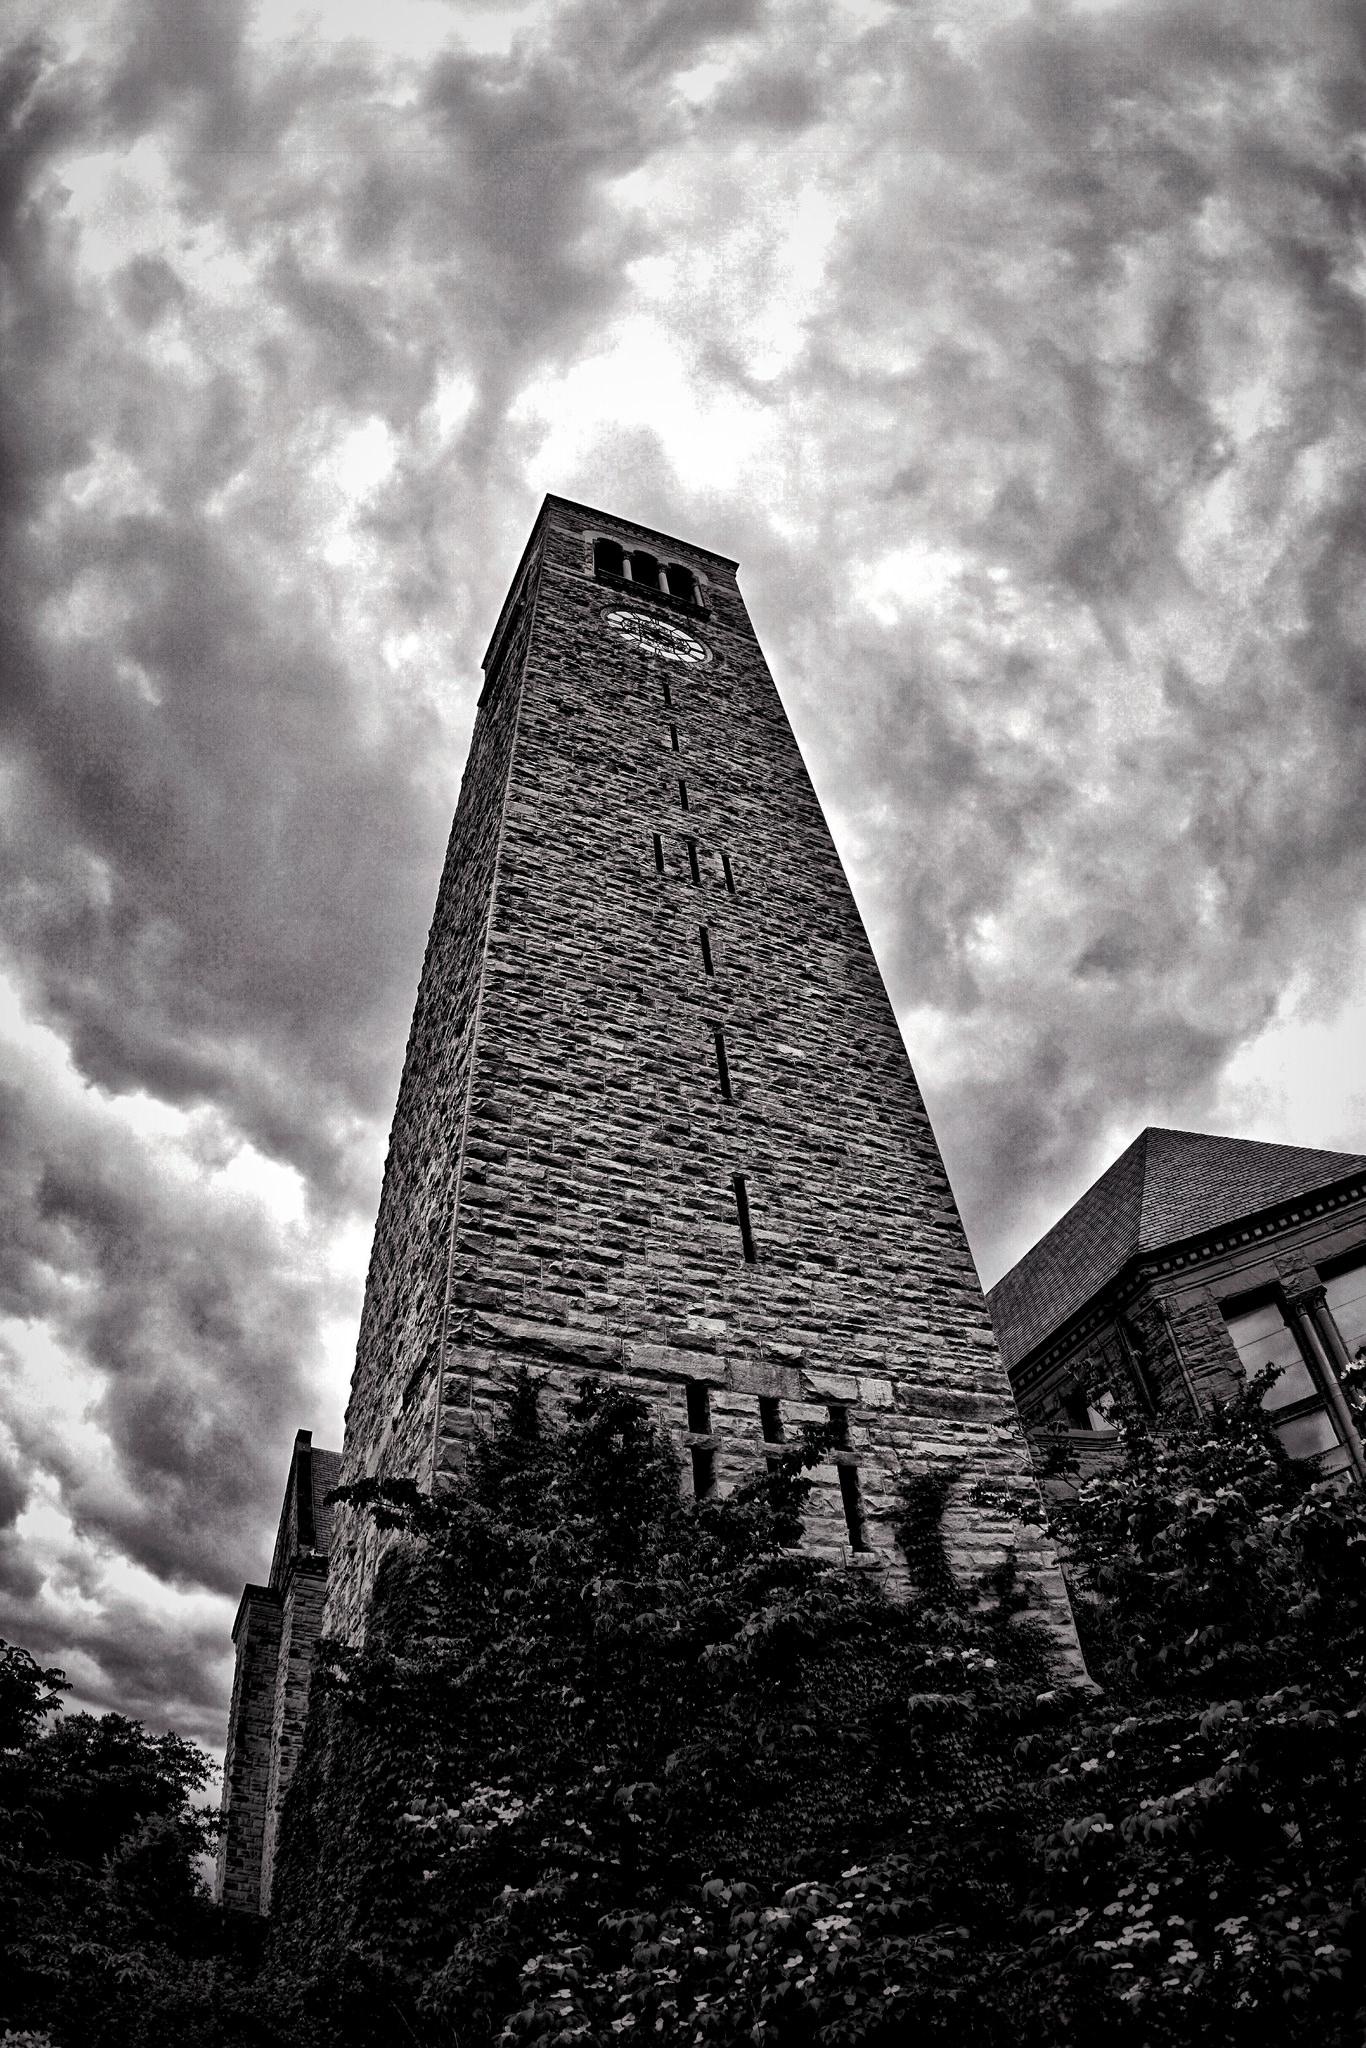 McGraw Tower